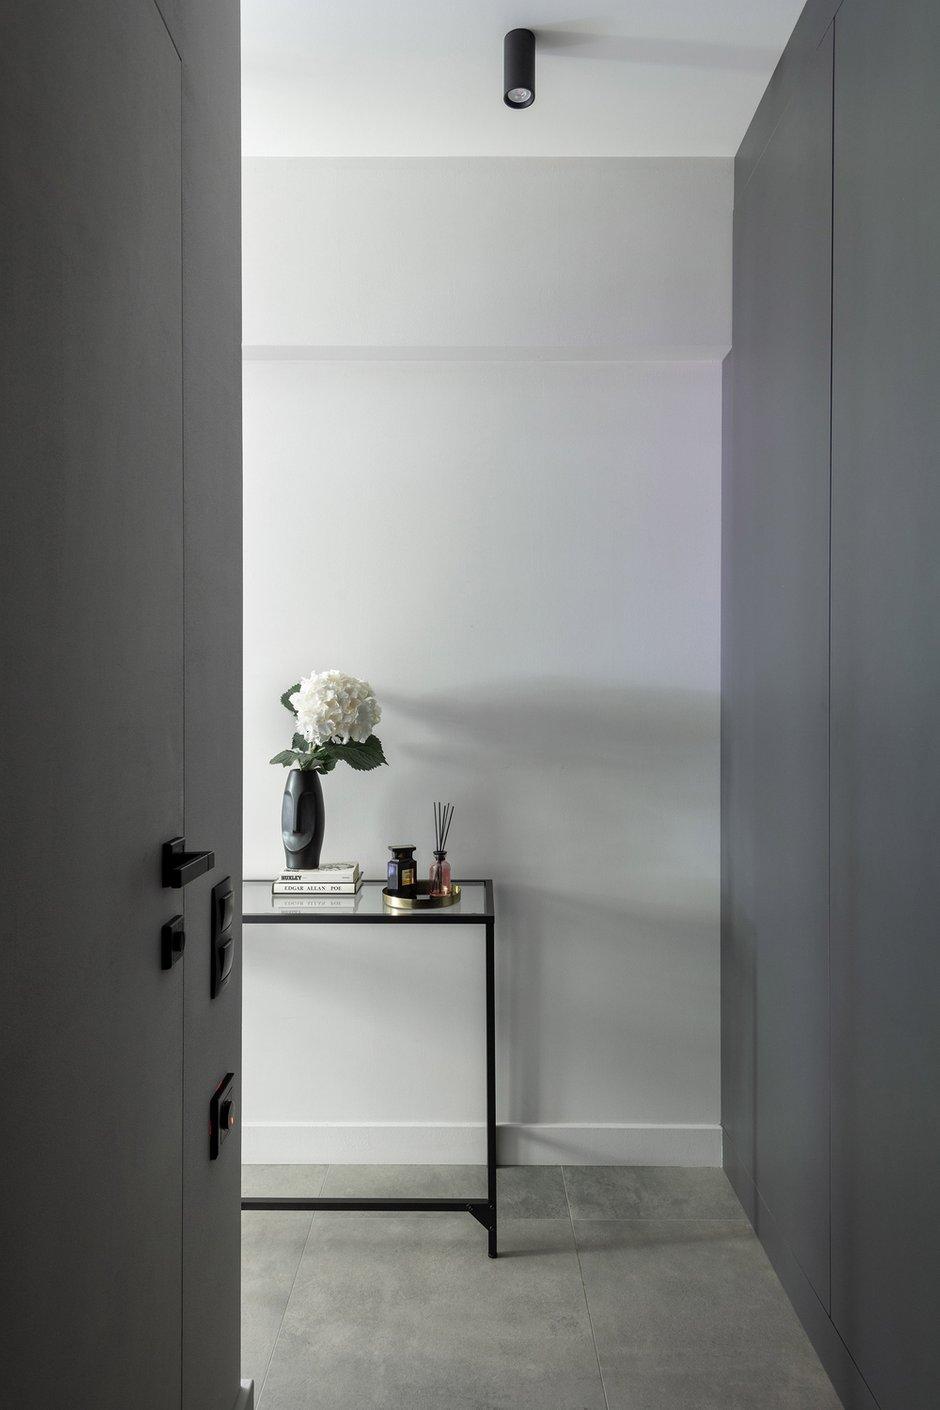 Фотография: Прихожая в стиле Современный, Малогабаритная квартира, Квартира, Студия, Проект недели, Москва, Хрущевка, 1 комната, Huge Studio – фото на INMYROOM